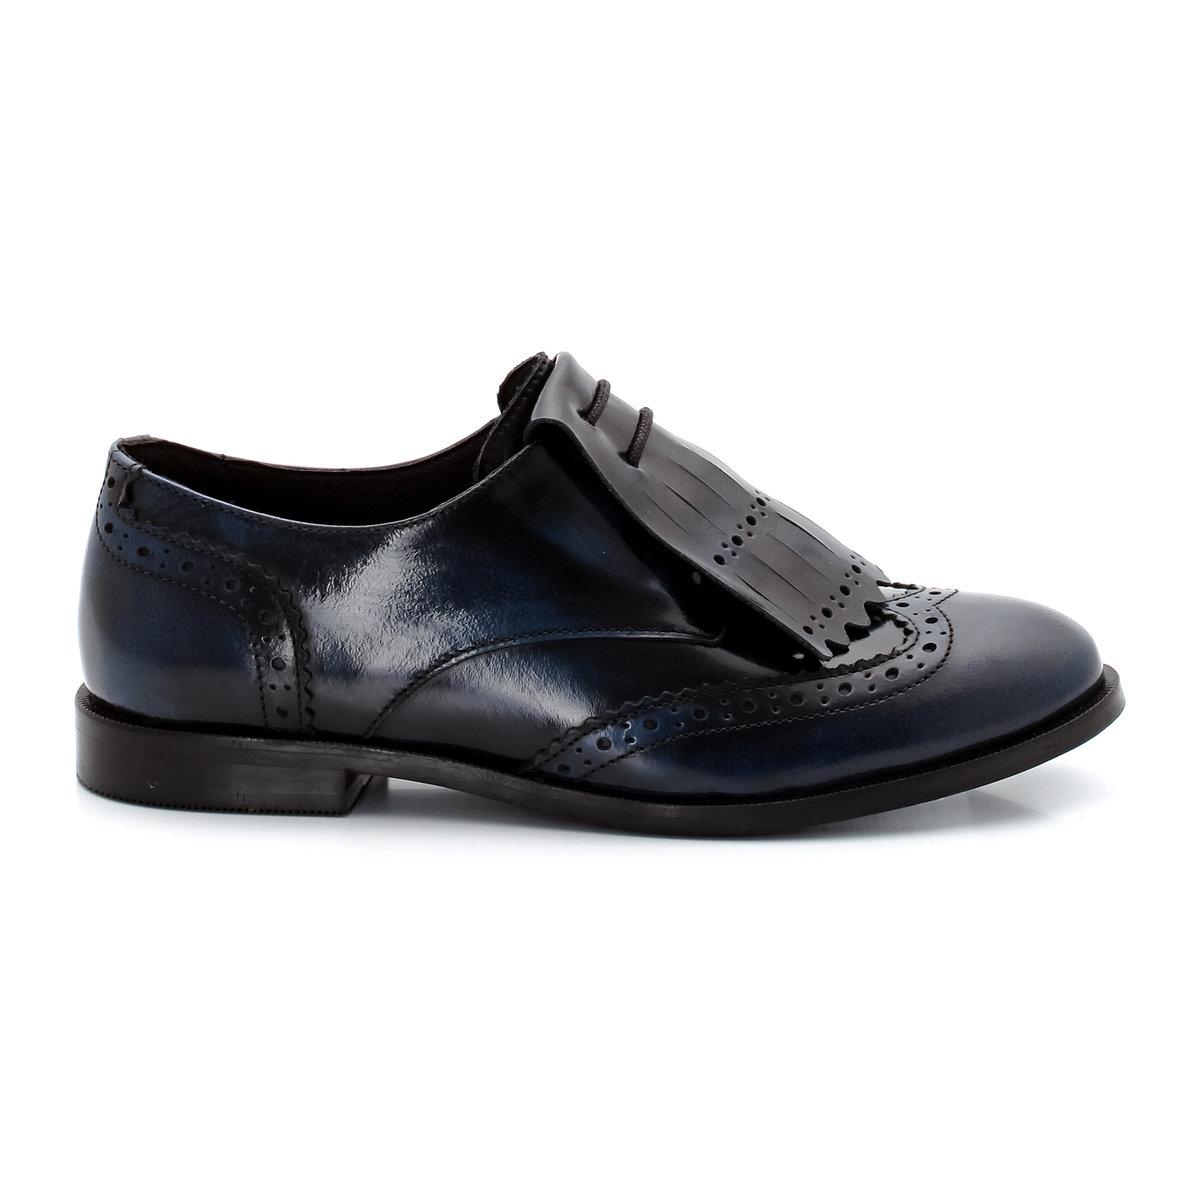 Ботинки-дерби из кожи с бахромой